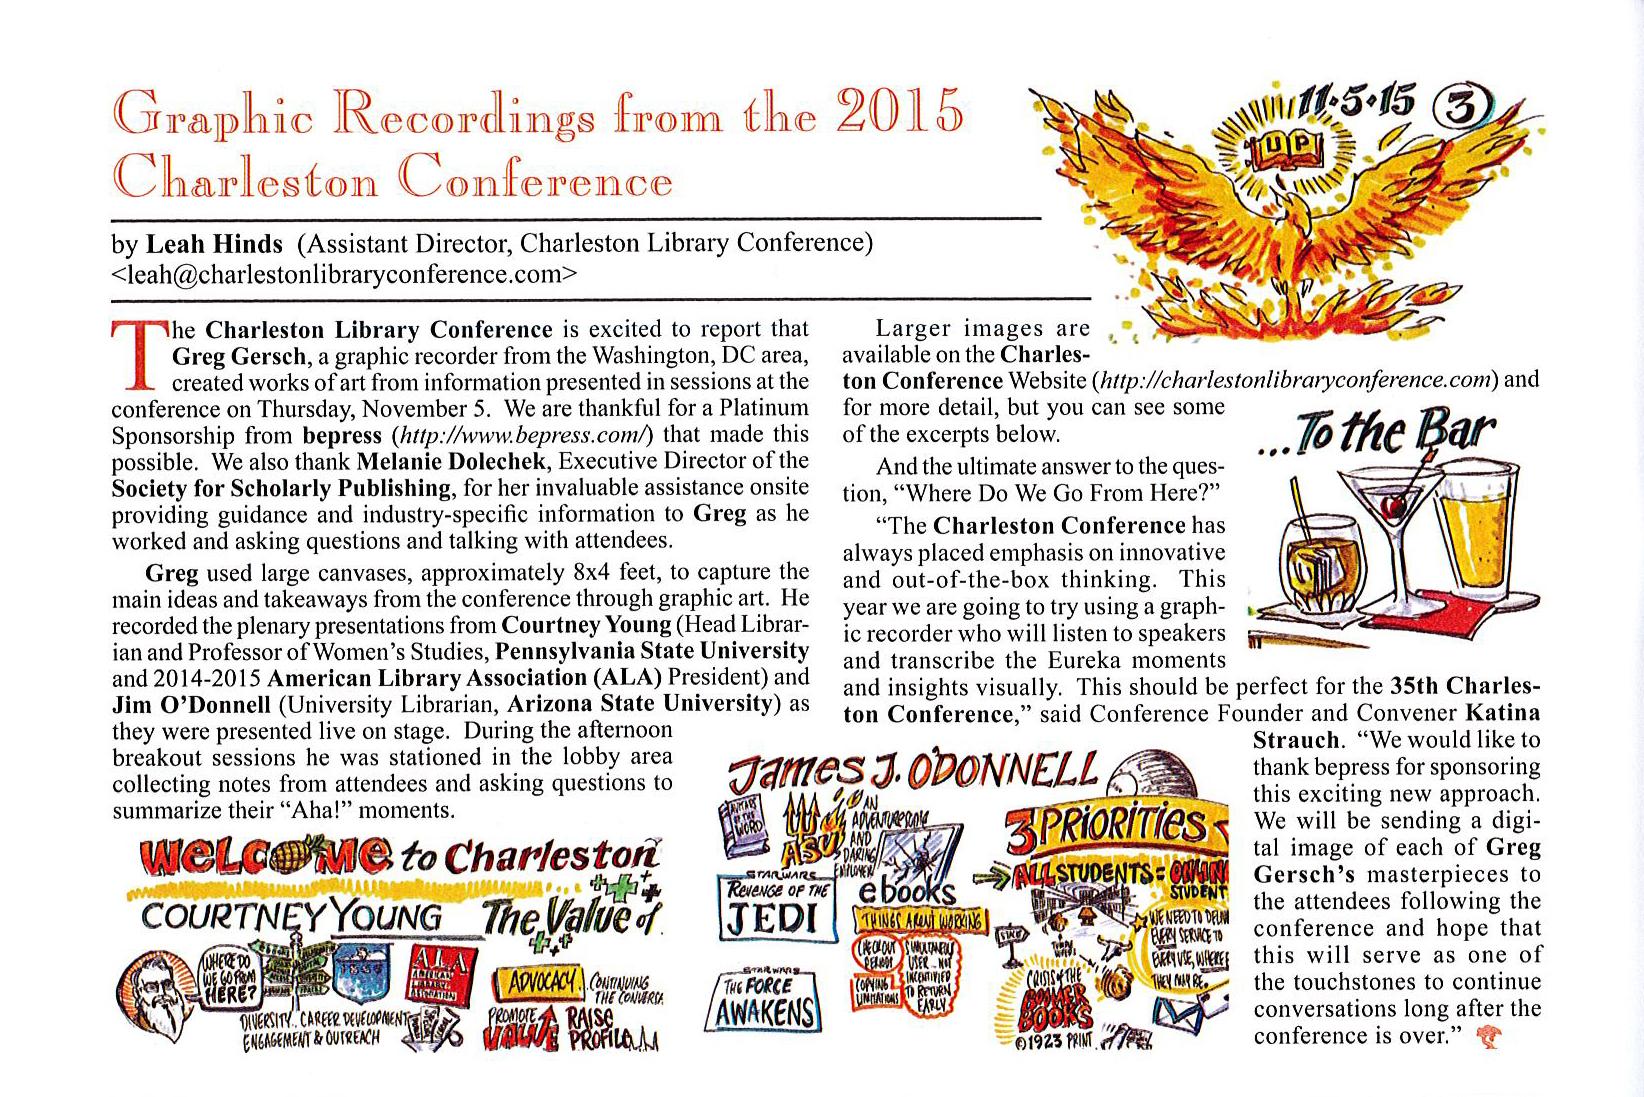 charleston-conference-2015.jpg